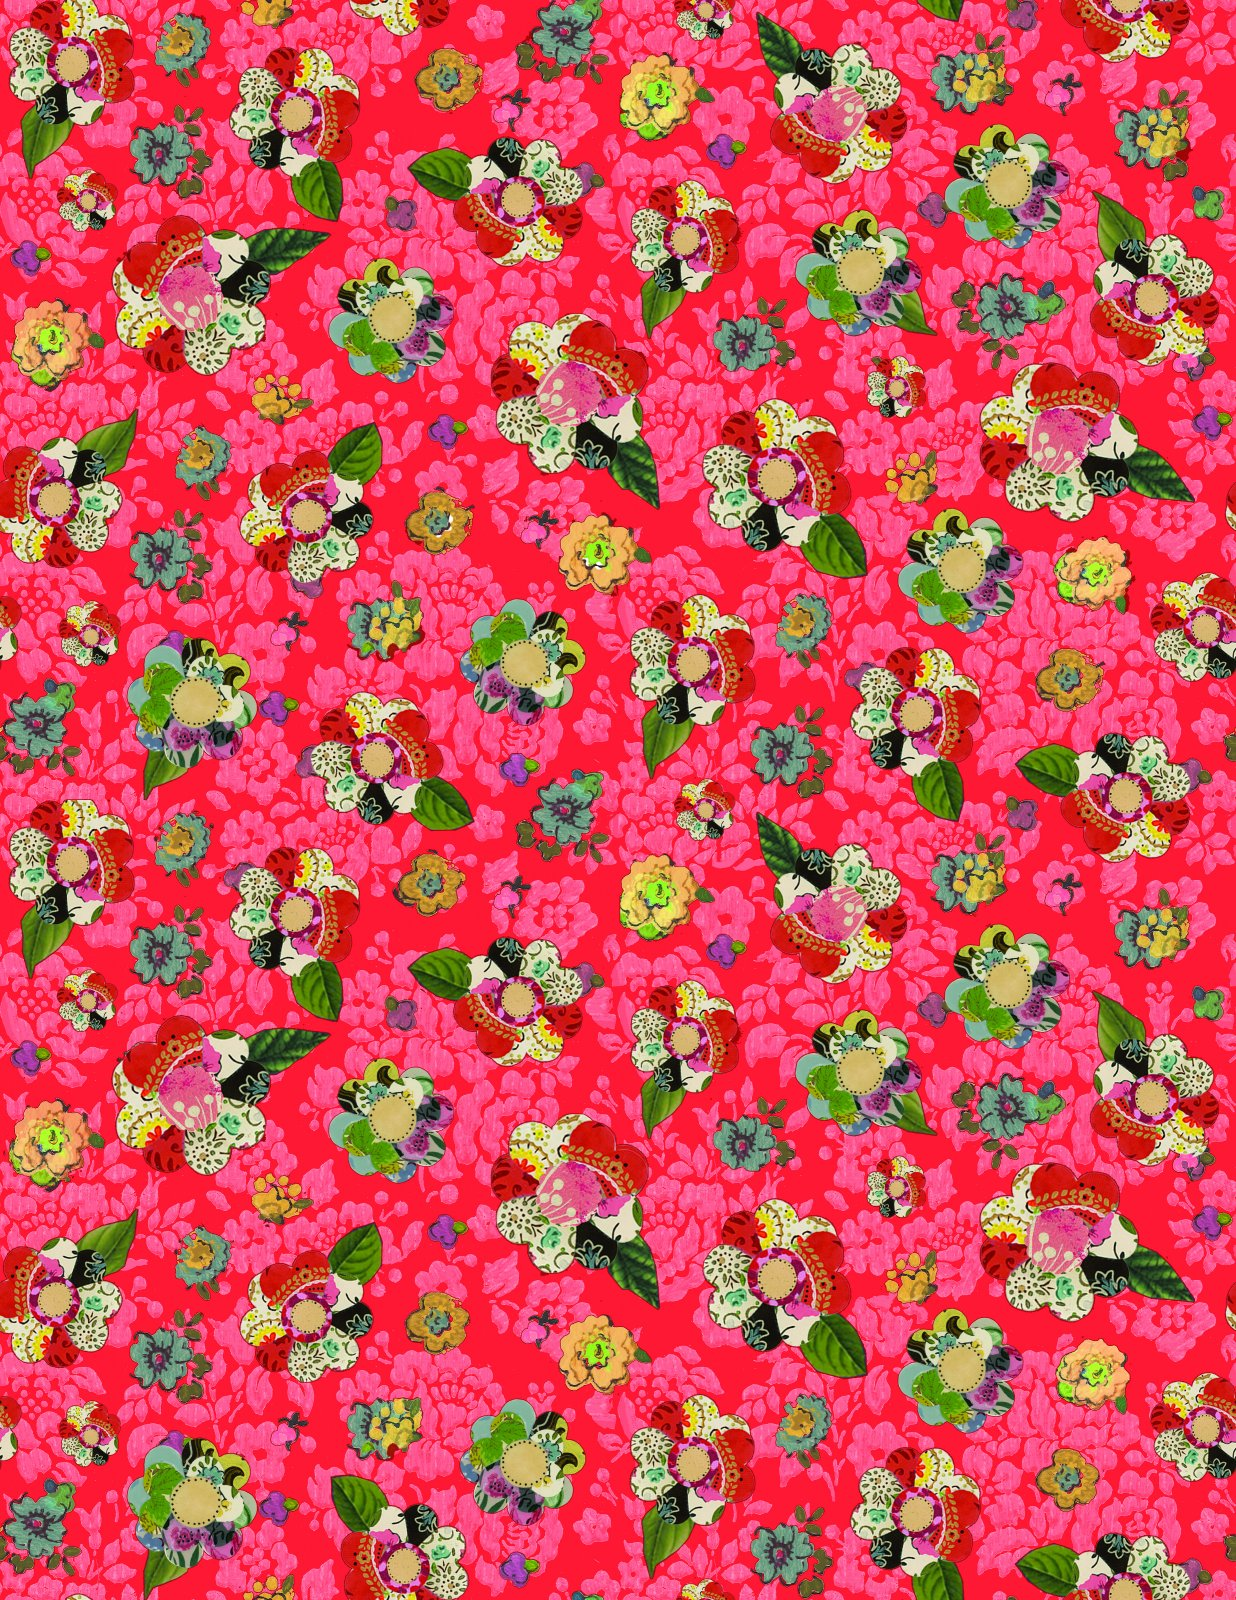 Benartex - Soul Shine & Daydreams - Collage Flower